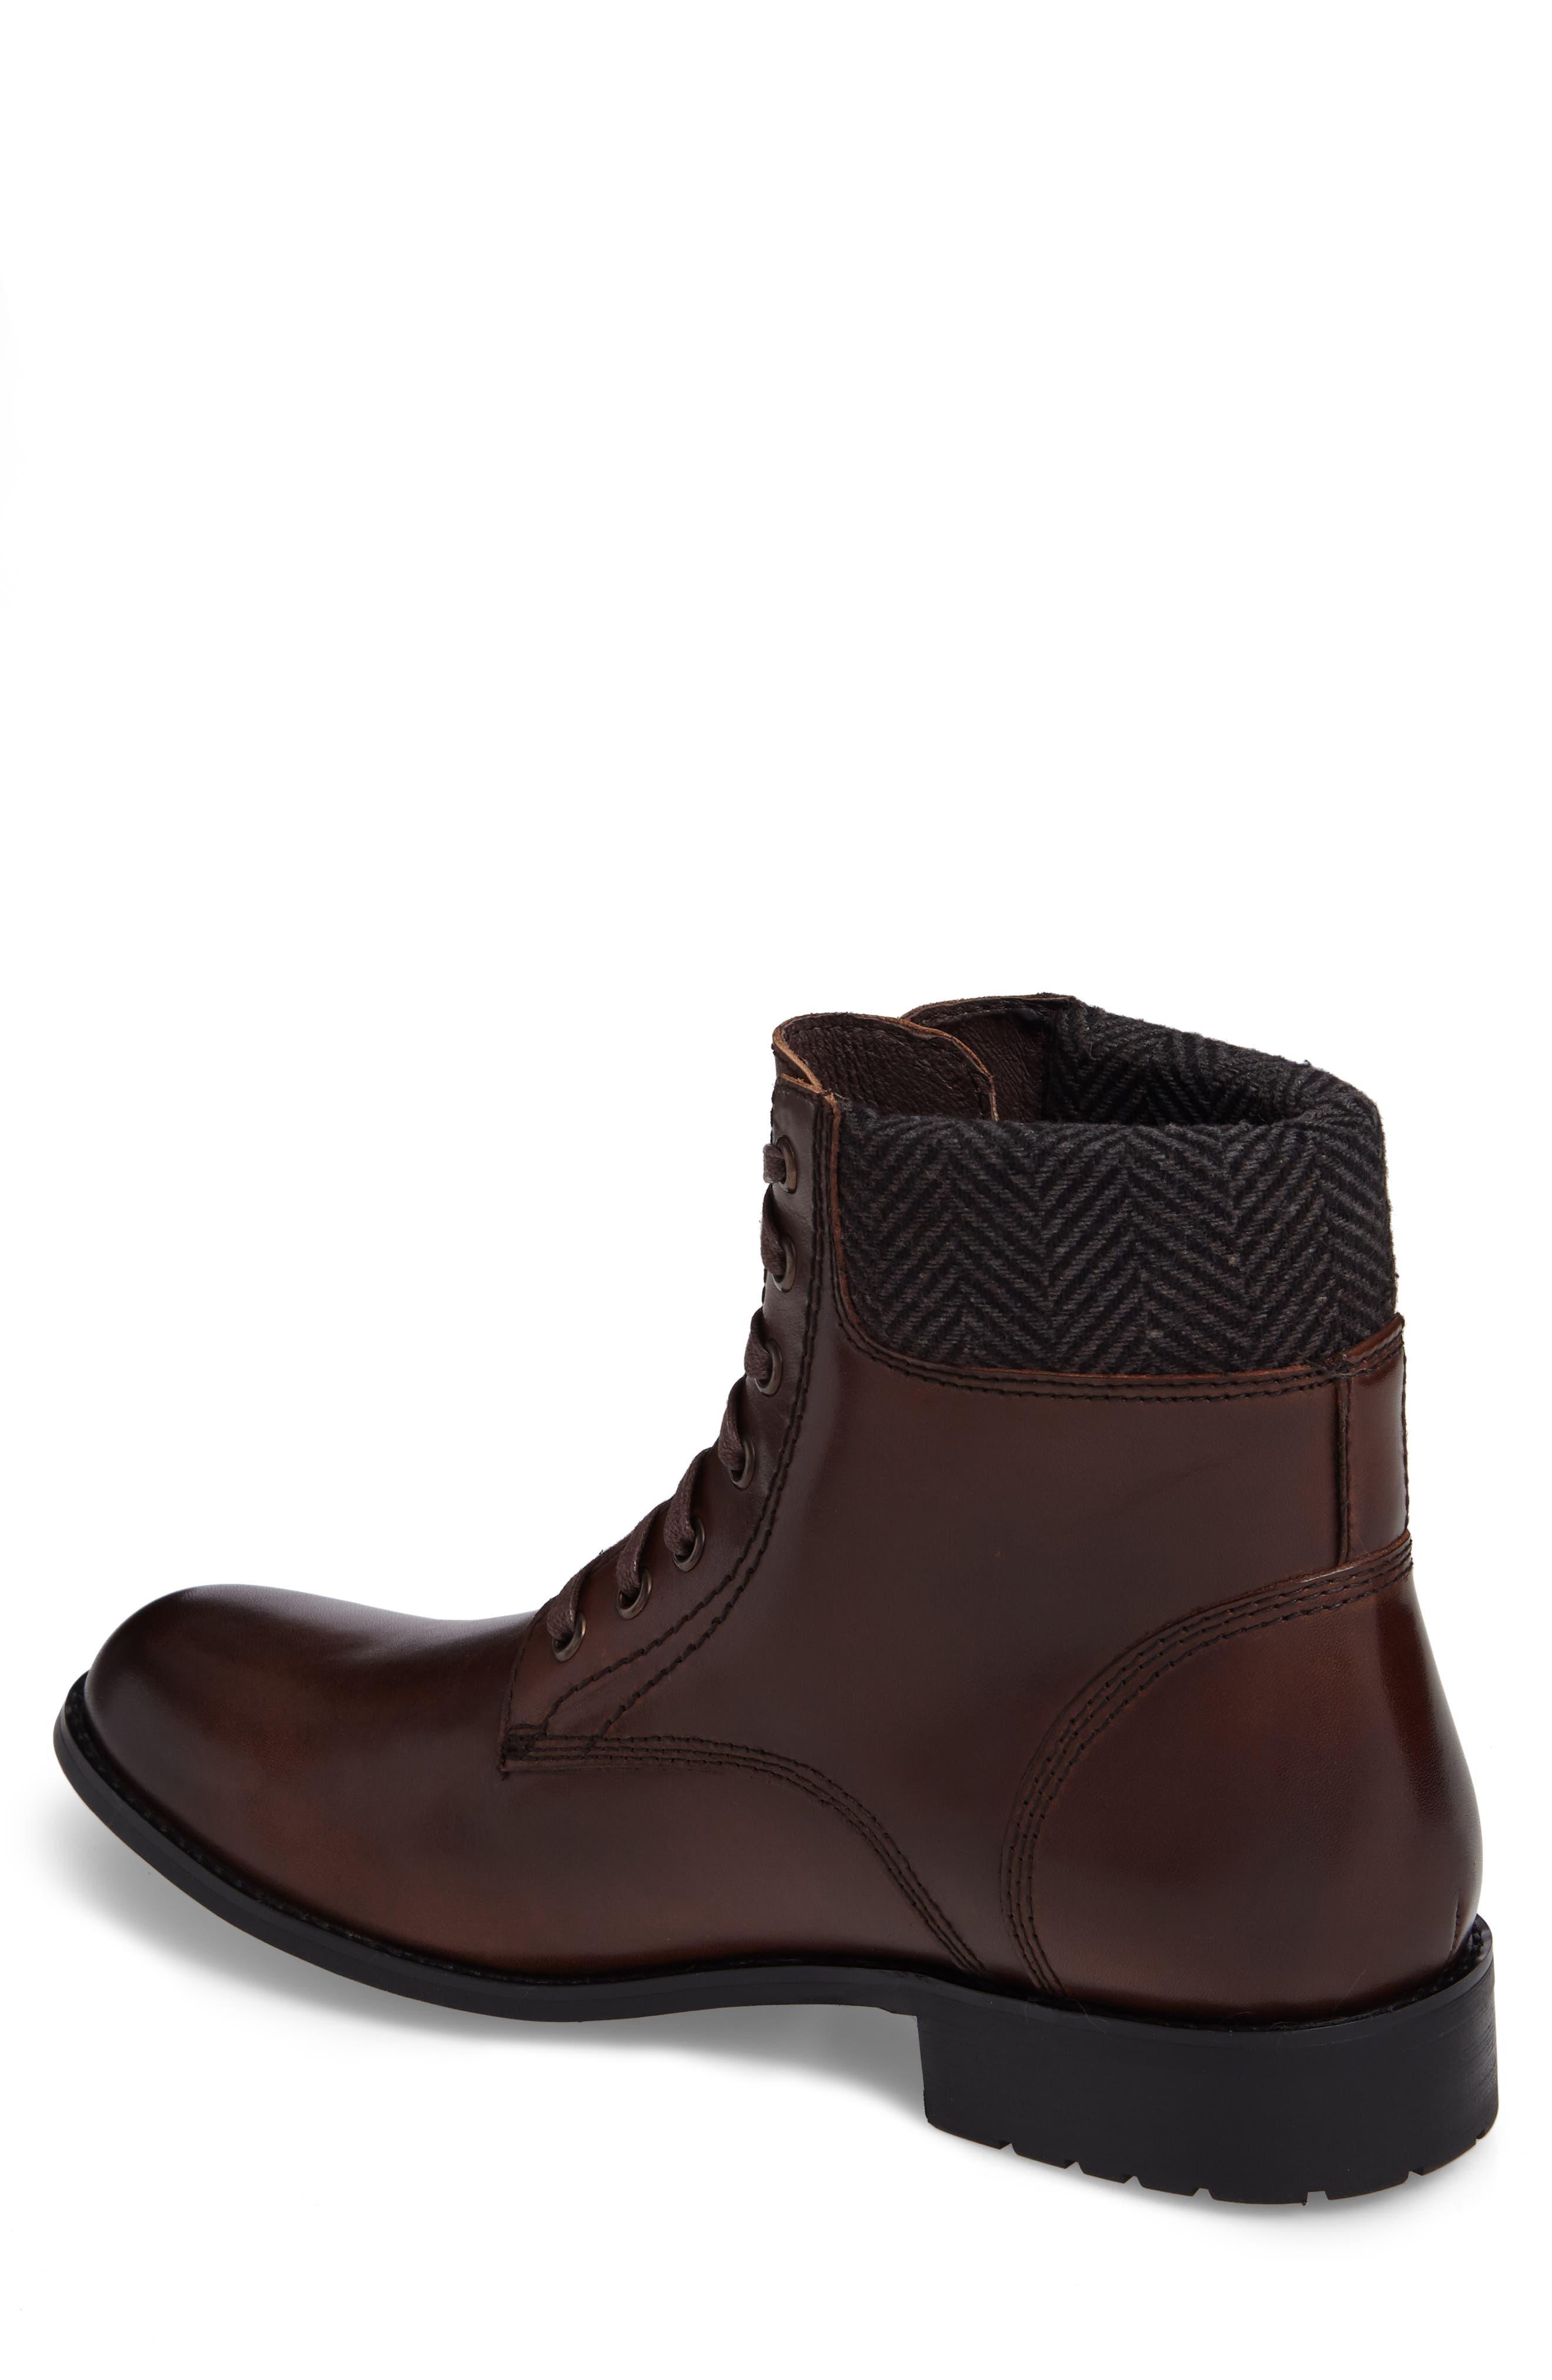 Saar Plain Toe Boot,                             Alternate thumbnail 2, color,                             Brown Leather